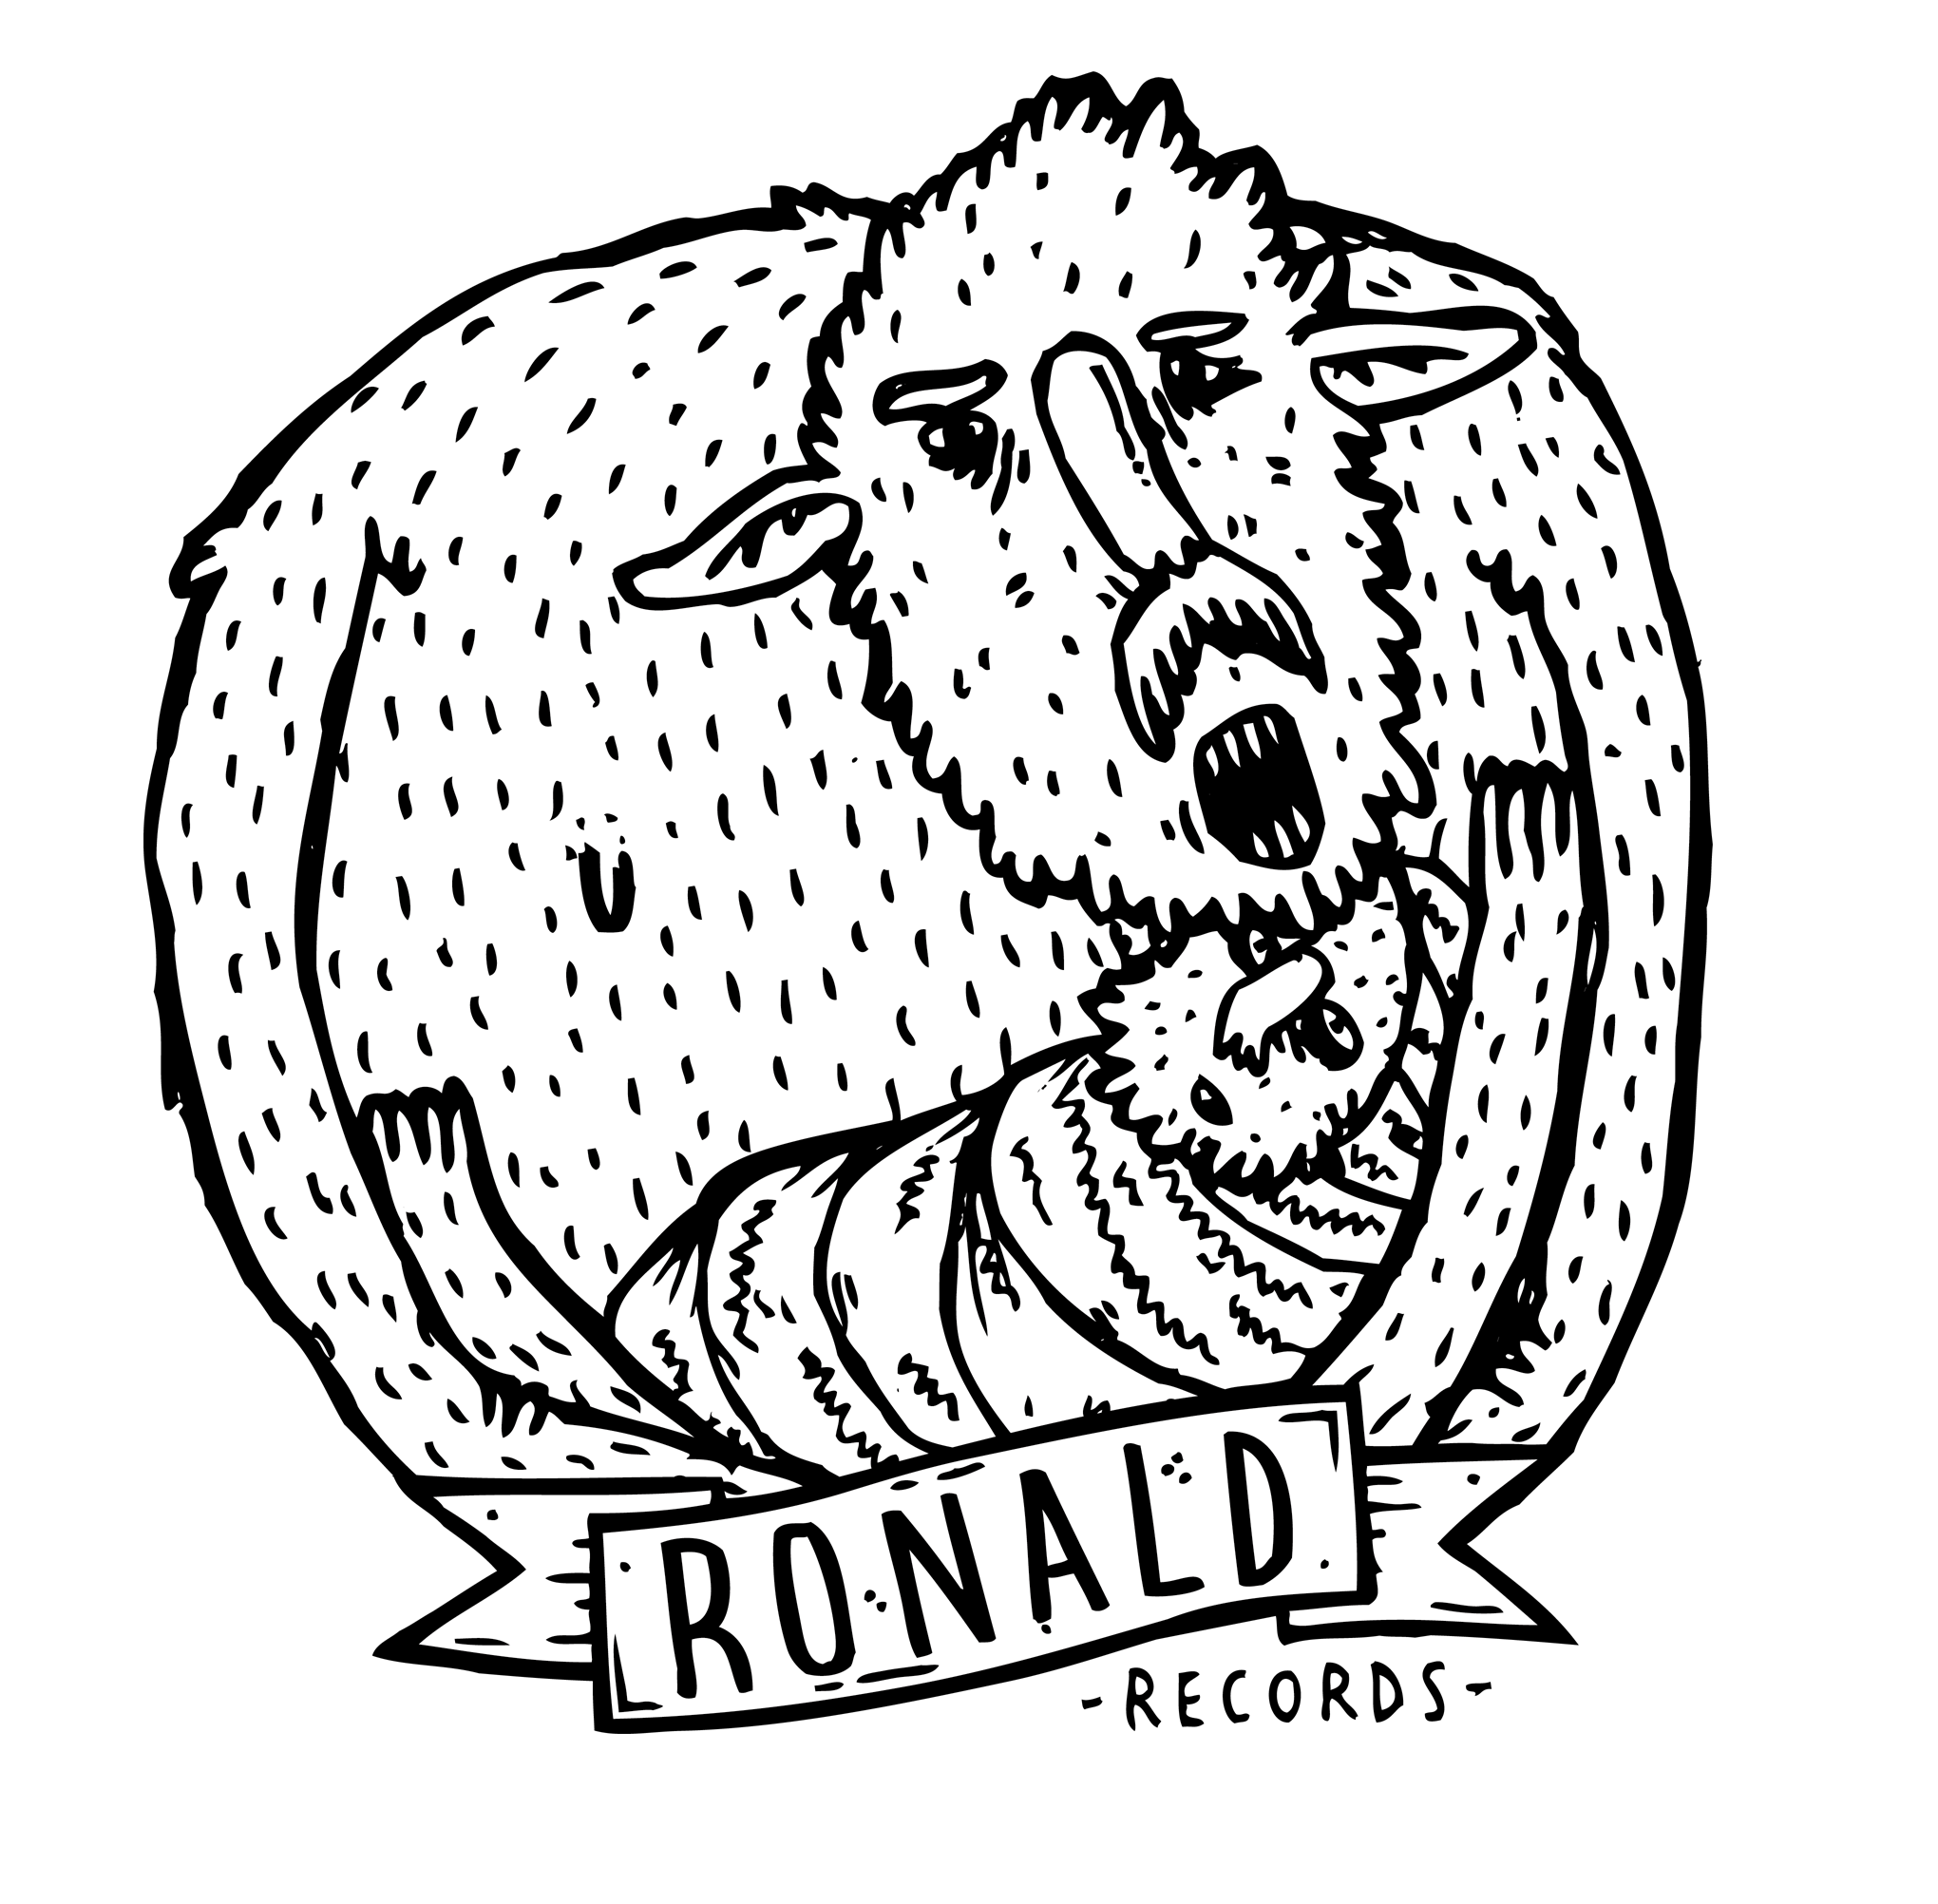 Ronald Records - Enamel Pin + Patch